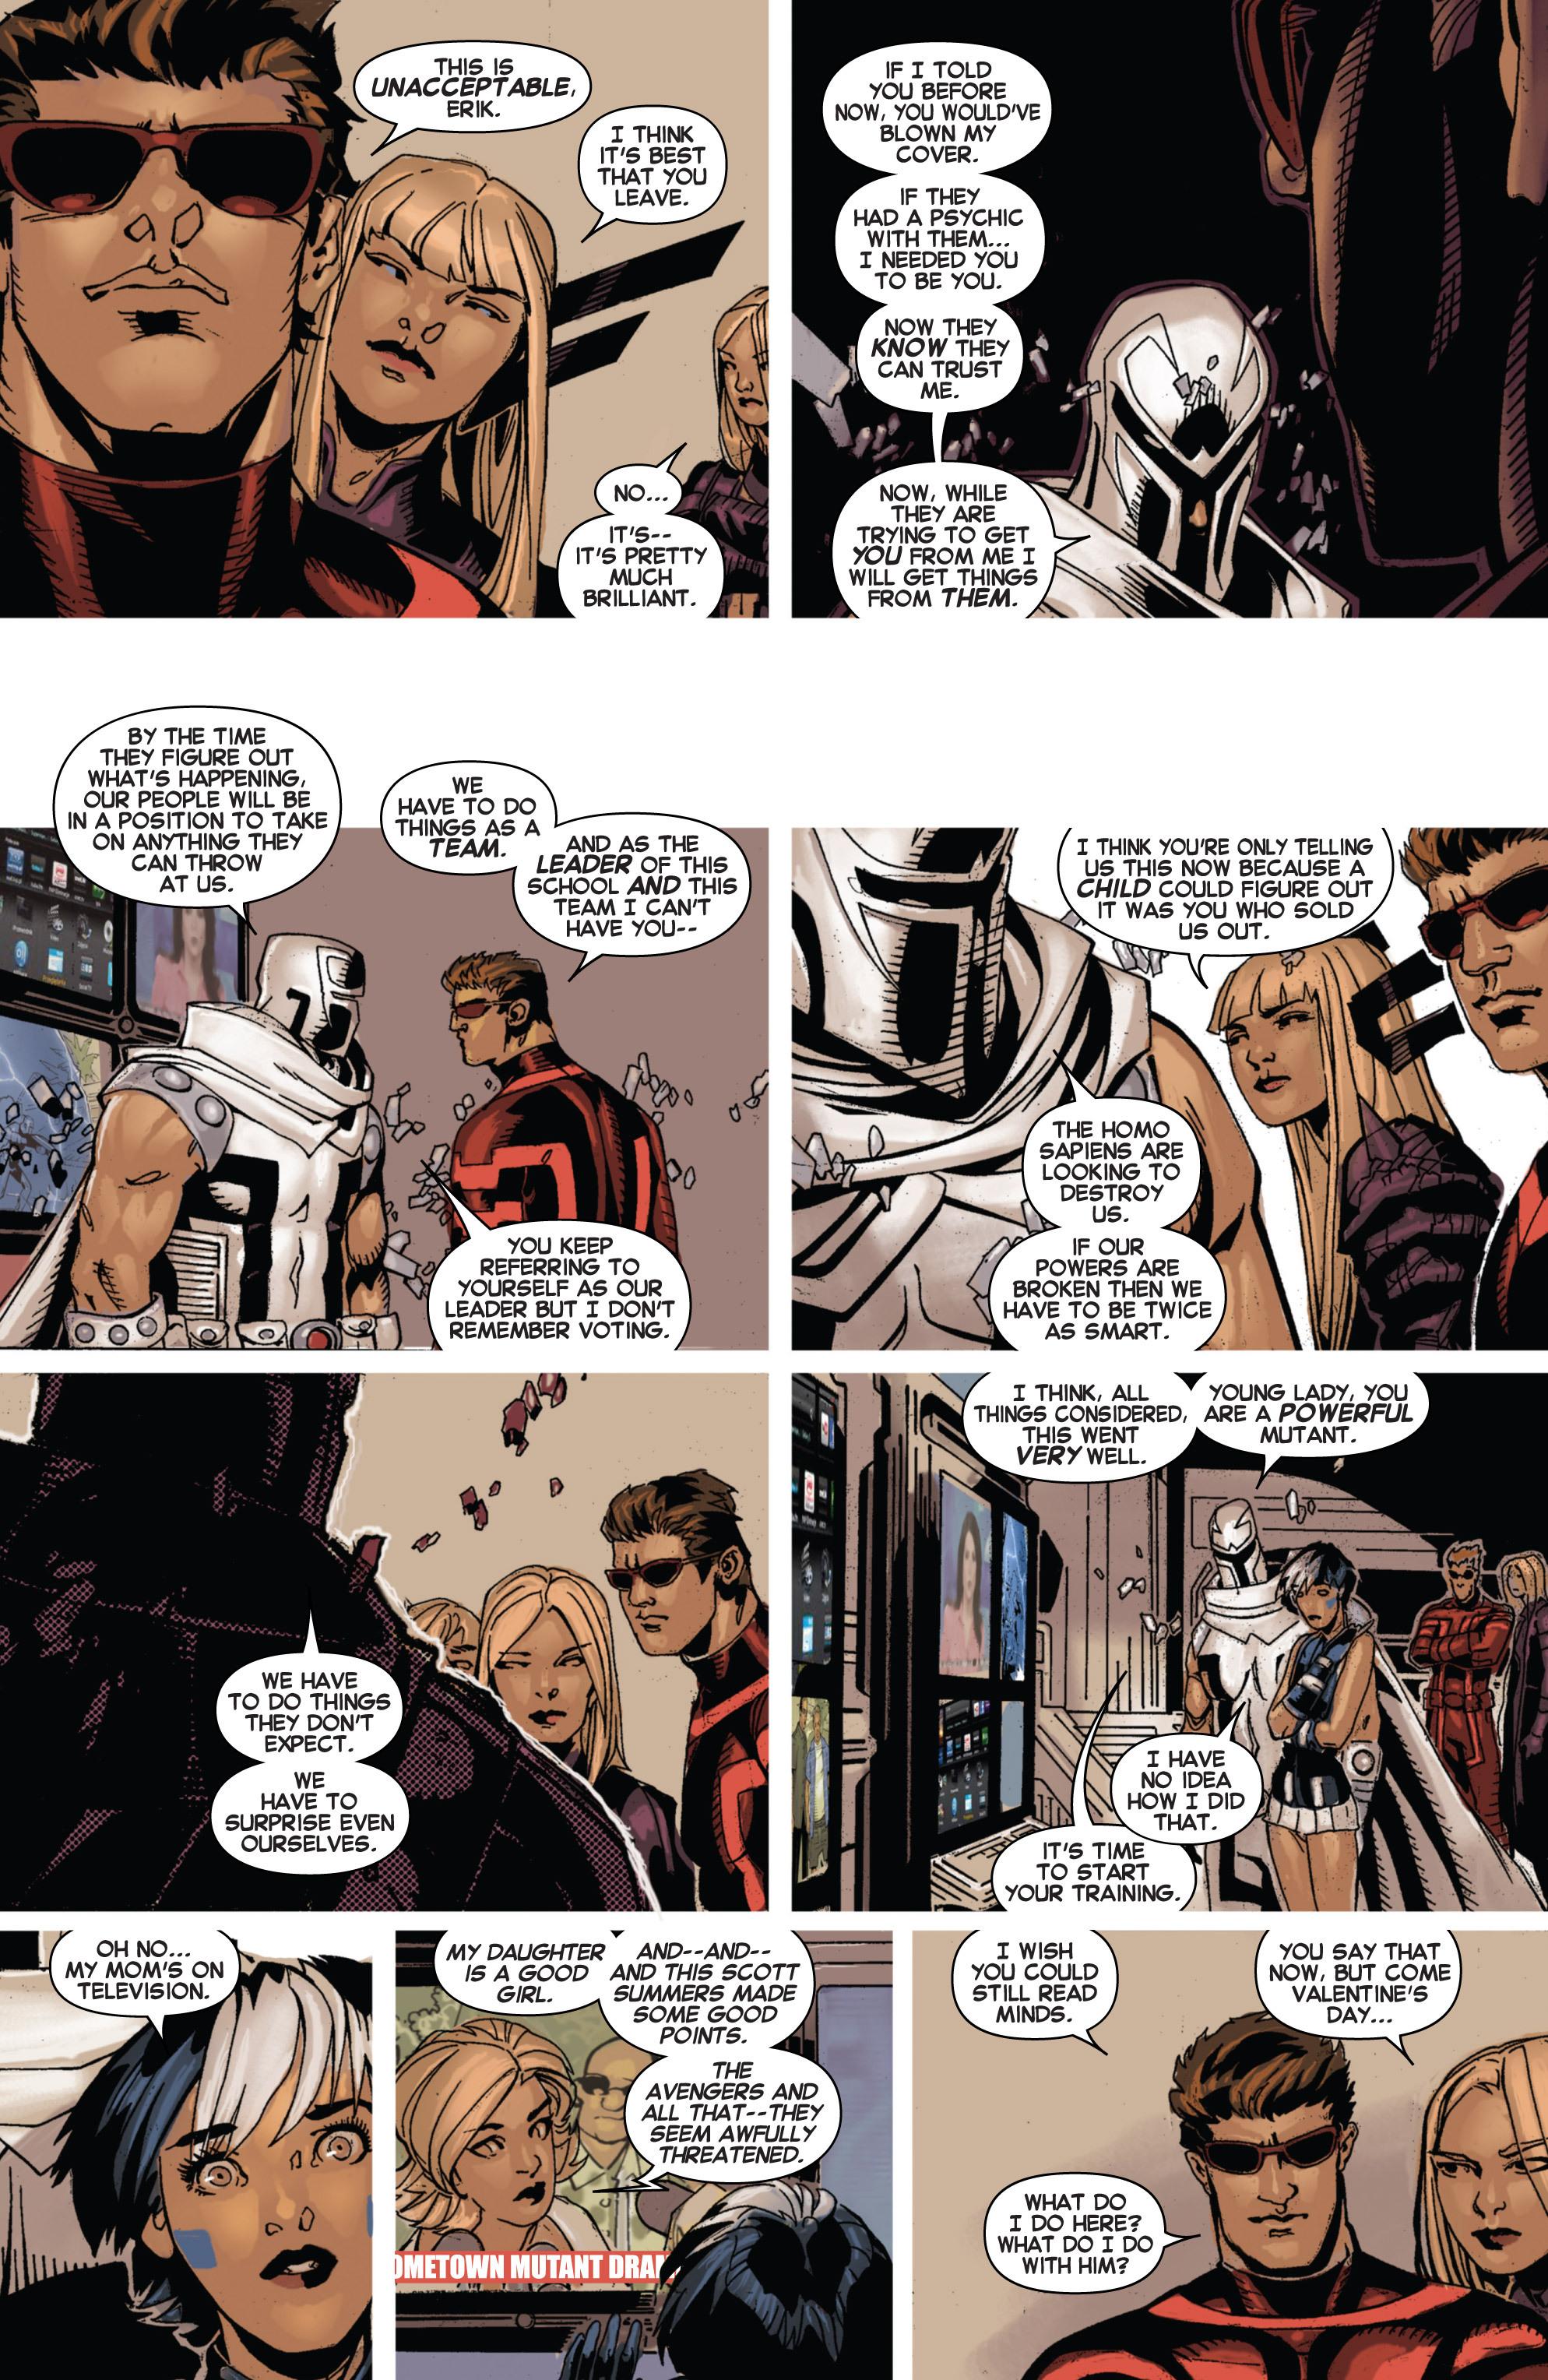 Read online Uncanny X-Men (2013) comic -  Issue # _TPB 1 - Revolution - 61